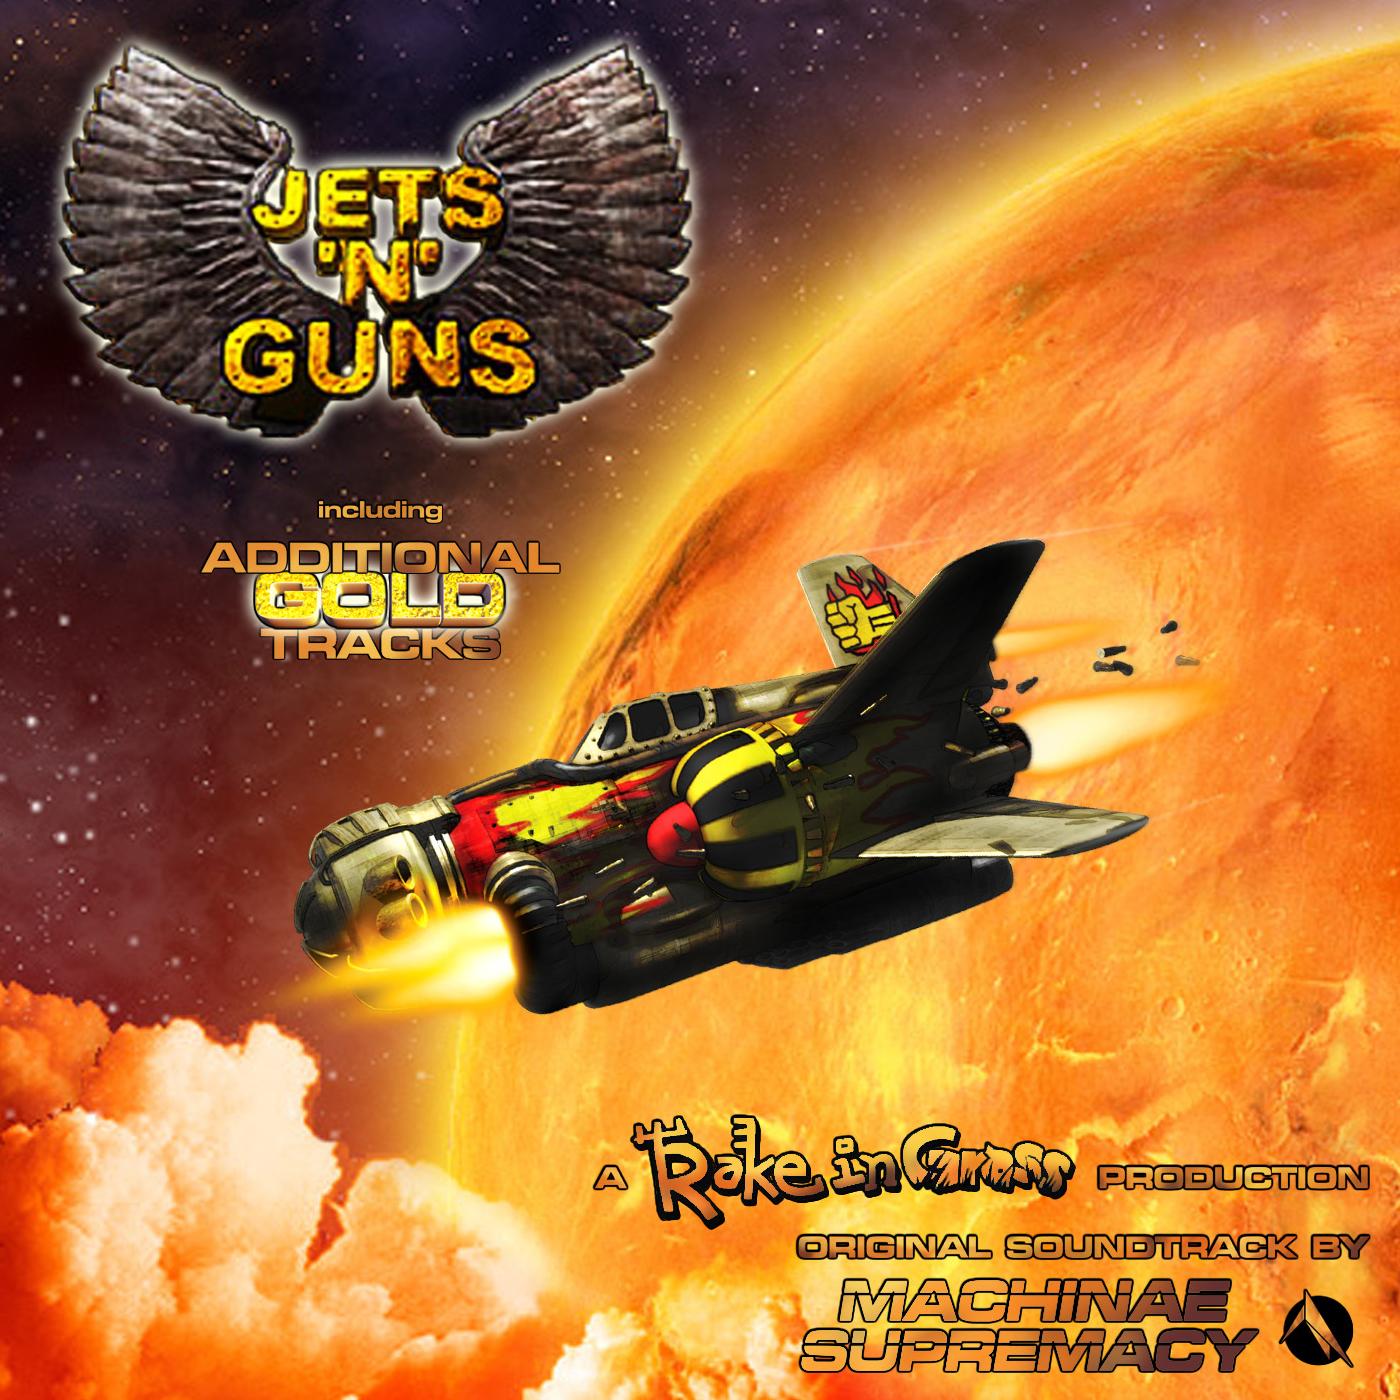 Jets'n'Guns Gold